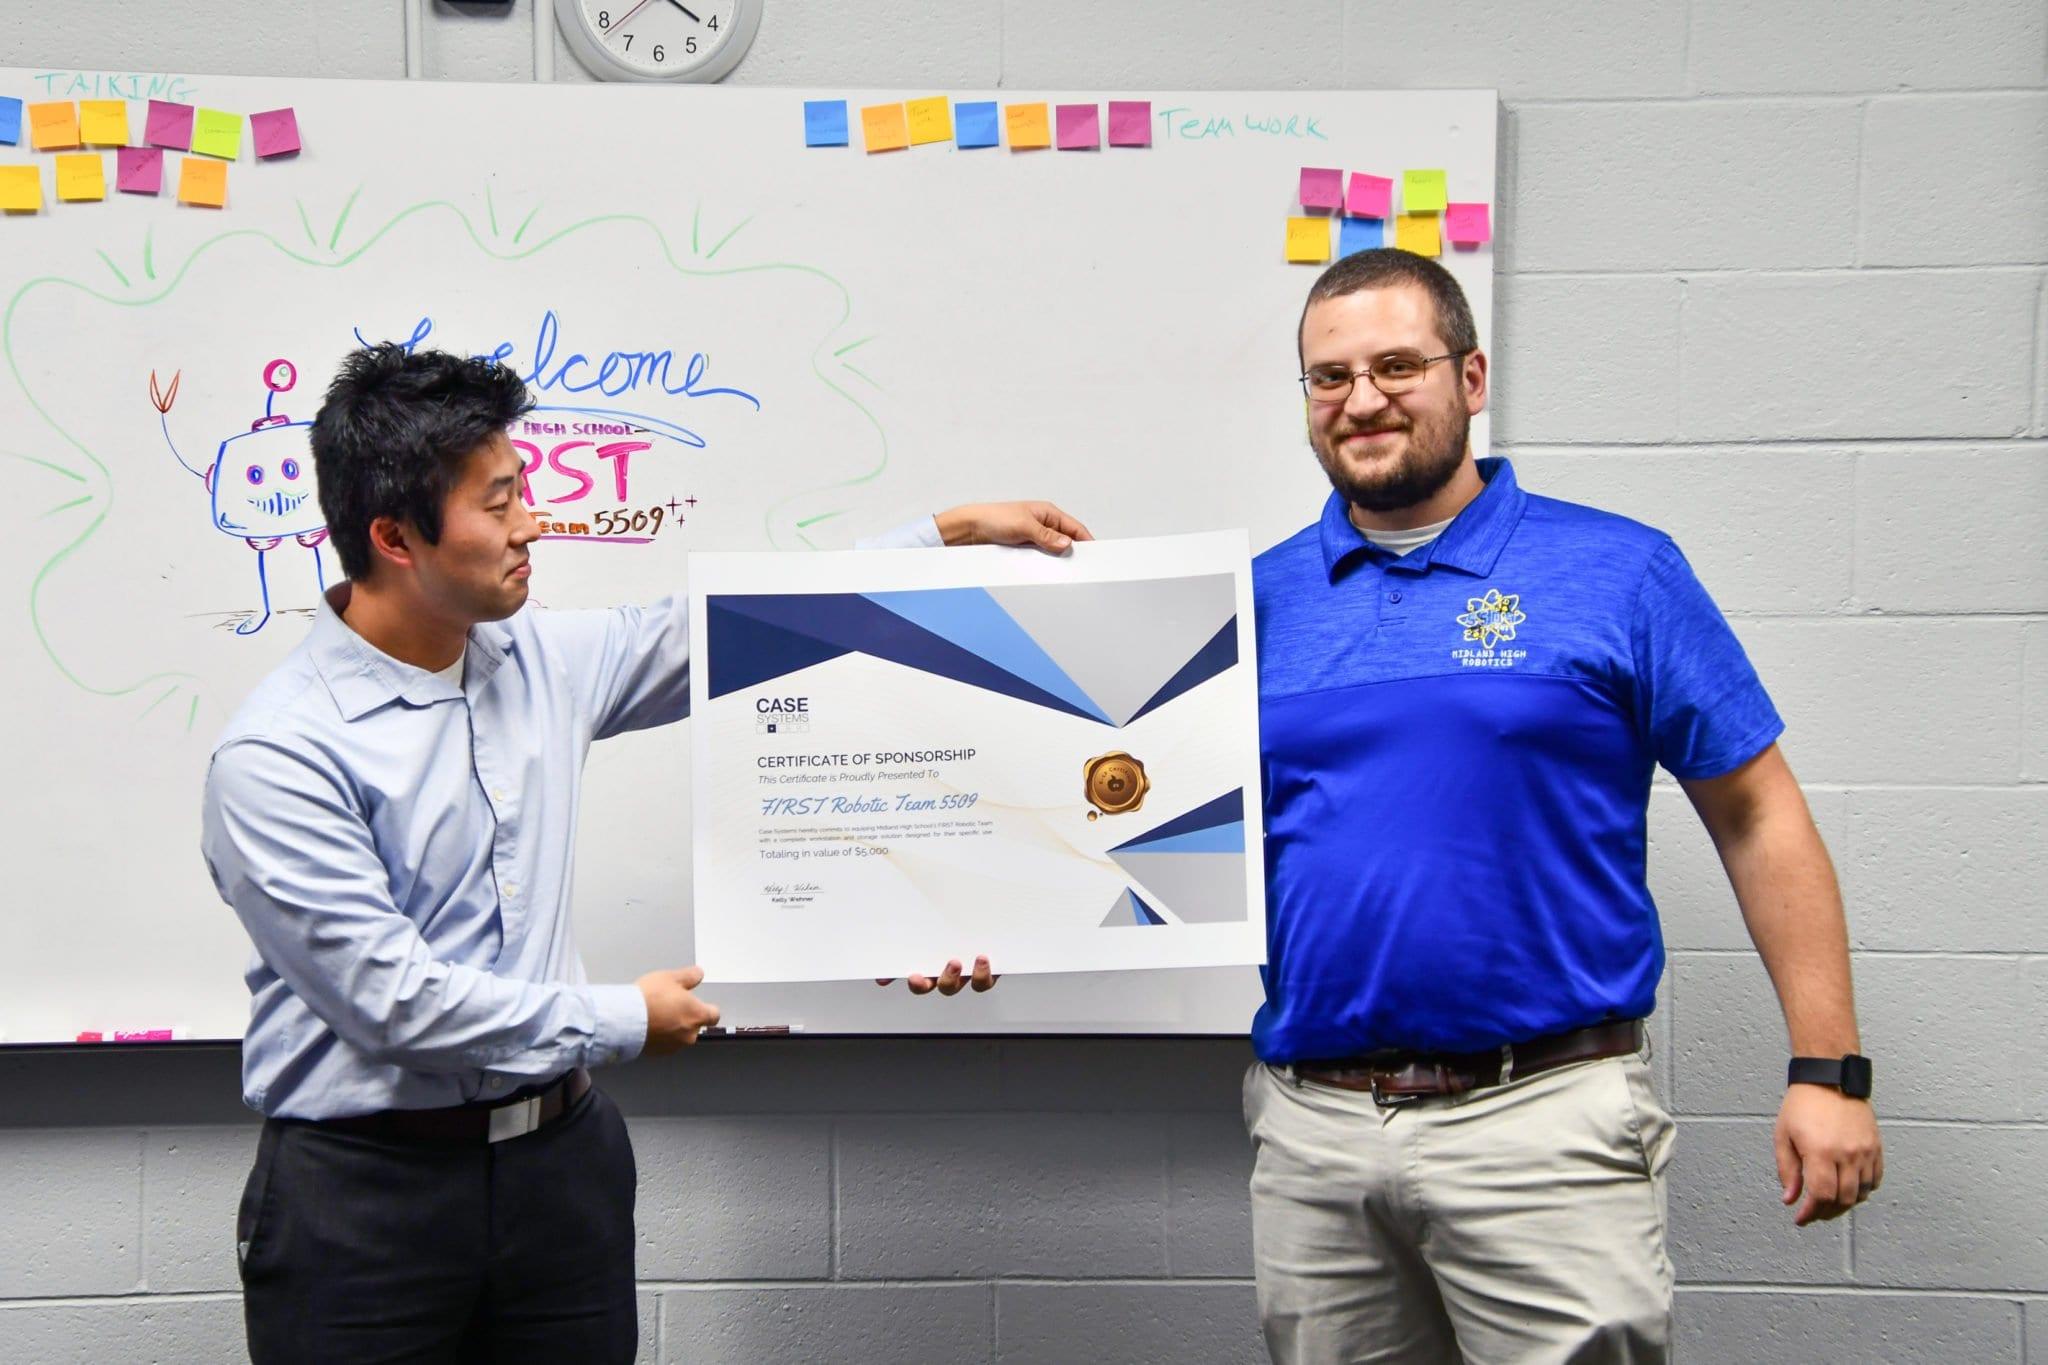 Case Systems sponsors Midland High School Robotics team